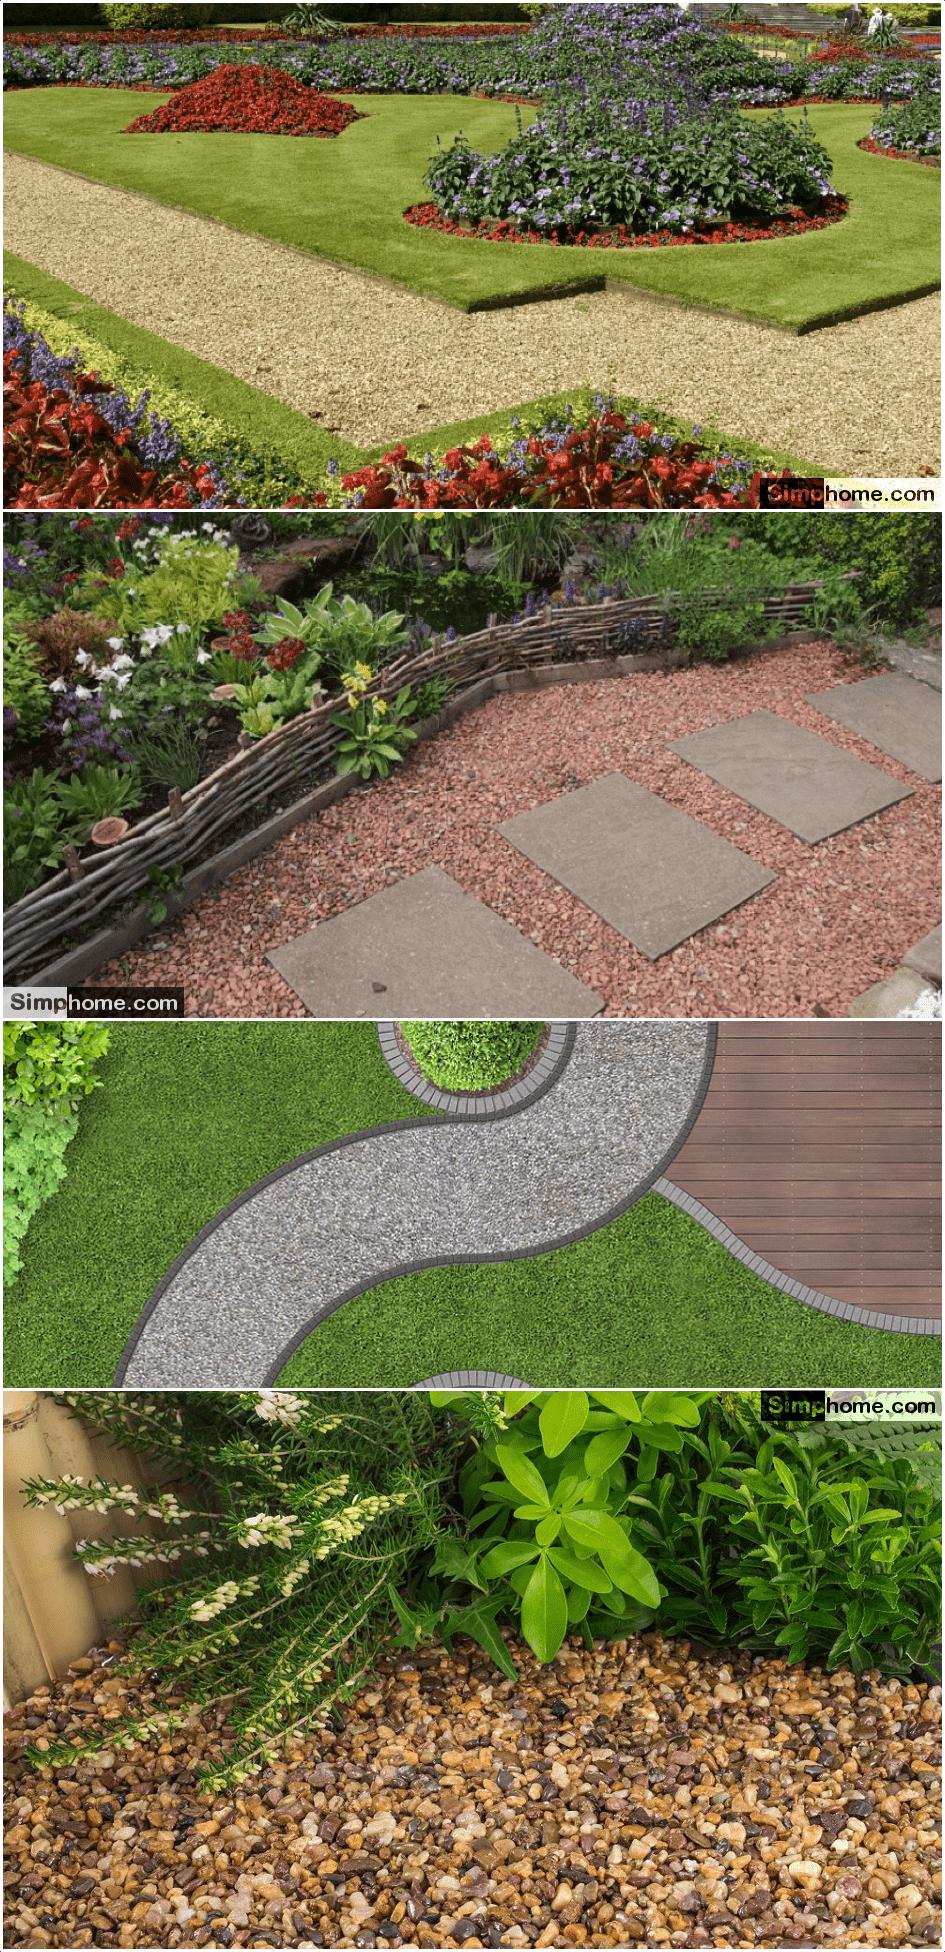 2.Backyard Pathway Ideas via Simphome.com